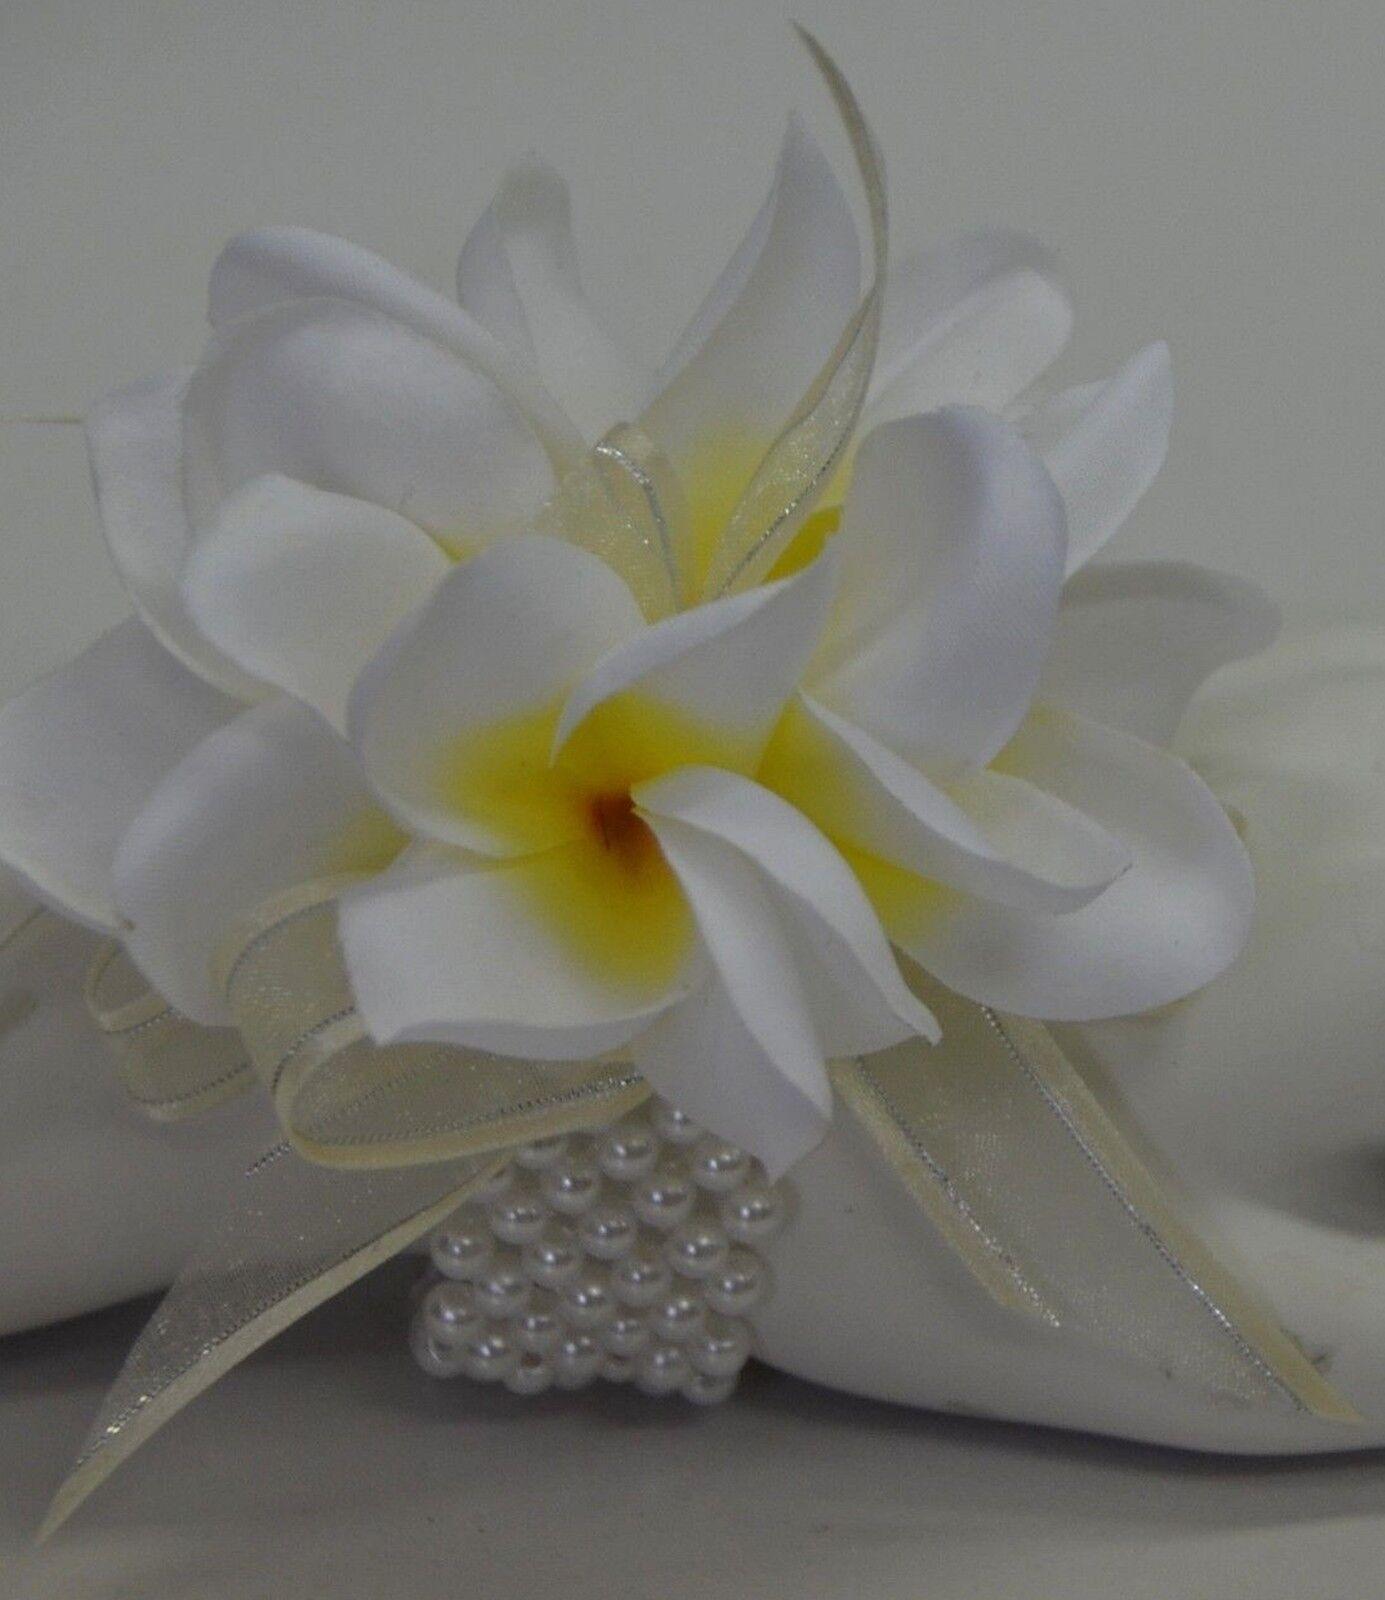 Silk Wedding Bouquet Frangipani Wrist Corsage Bridal Flower White